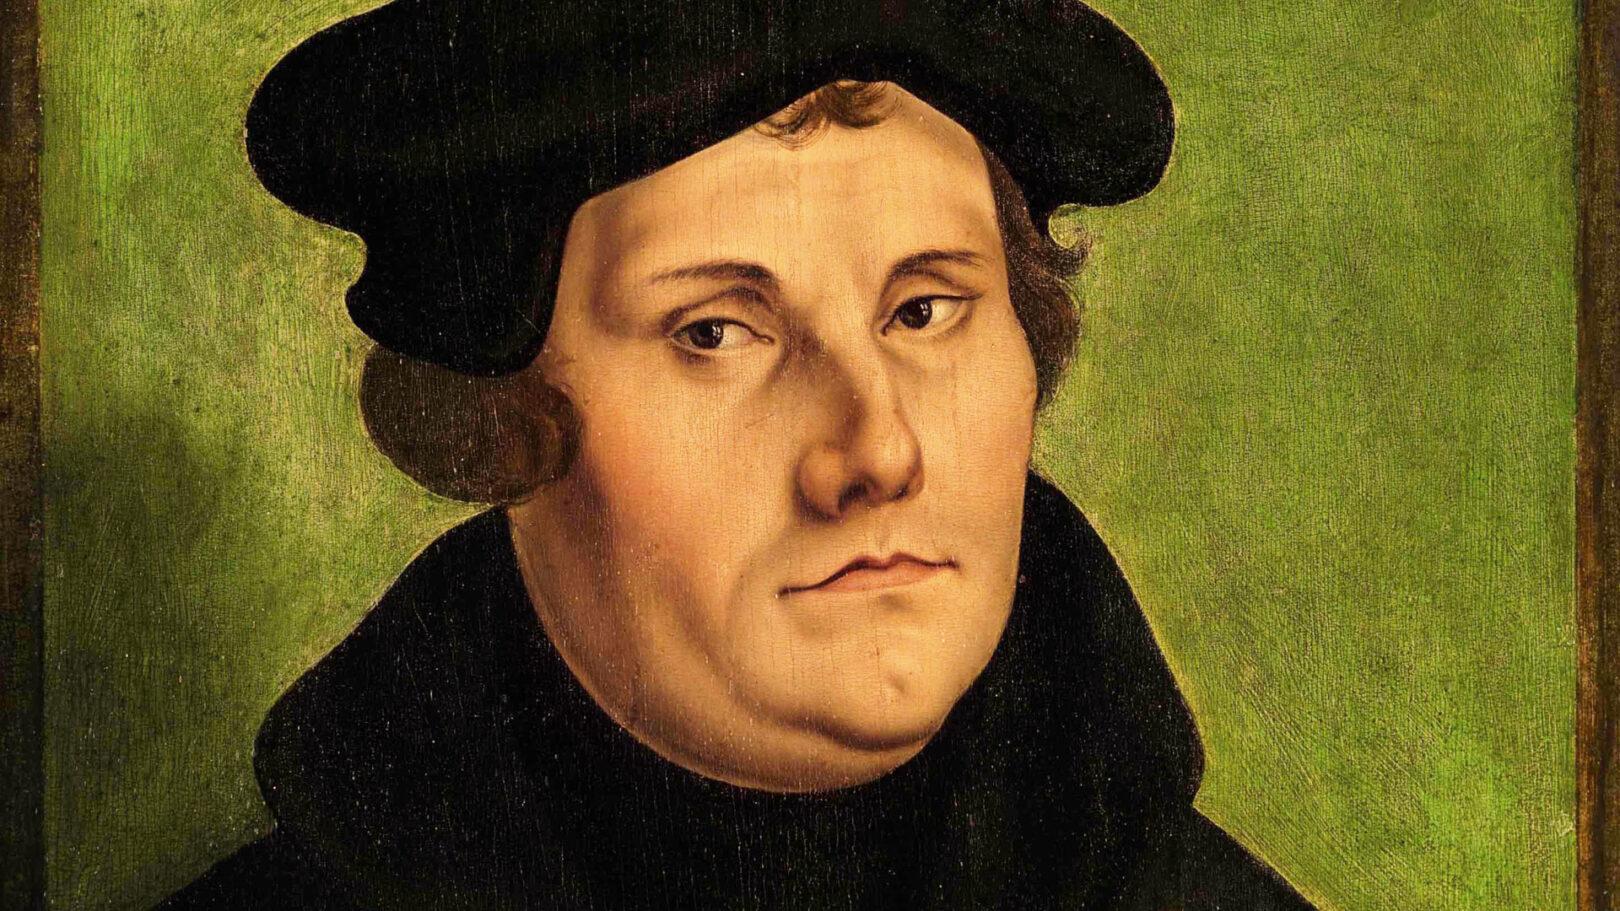 Martin Luther velja za začetnika reformacije.